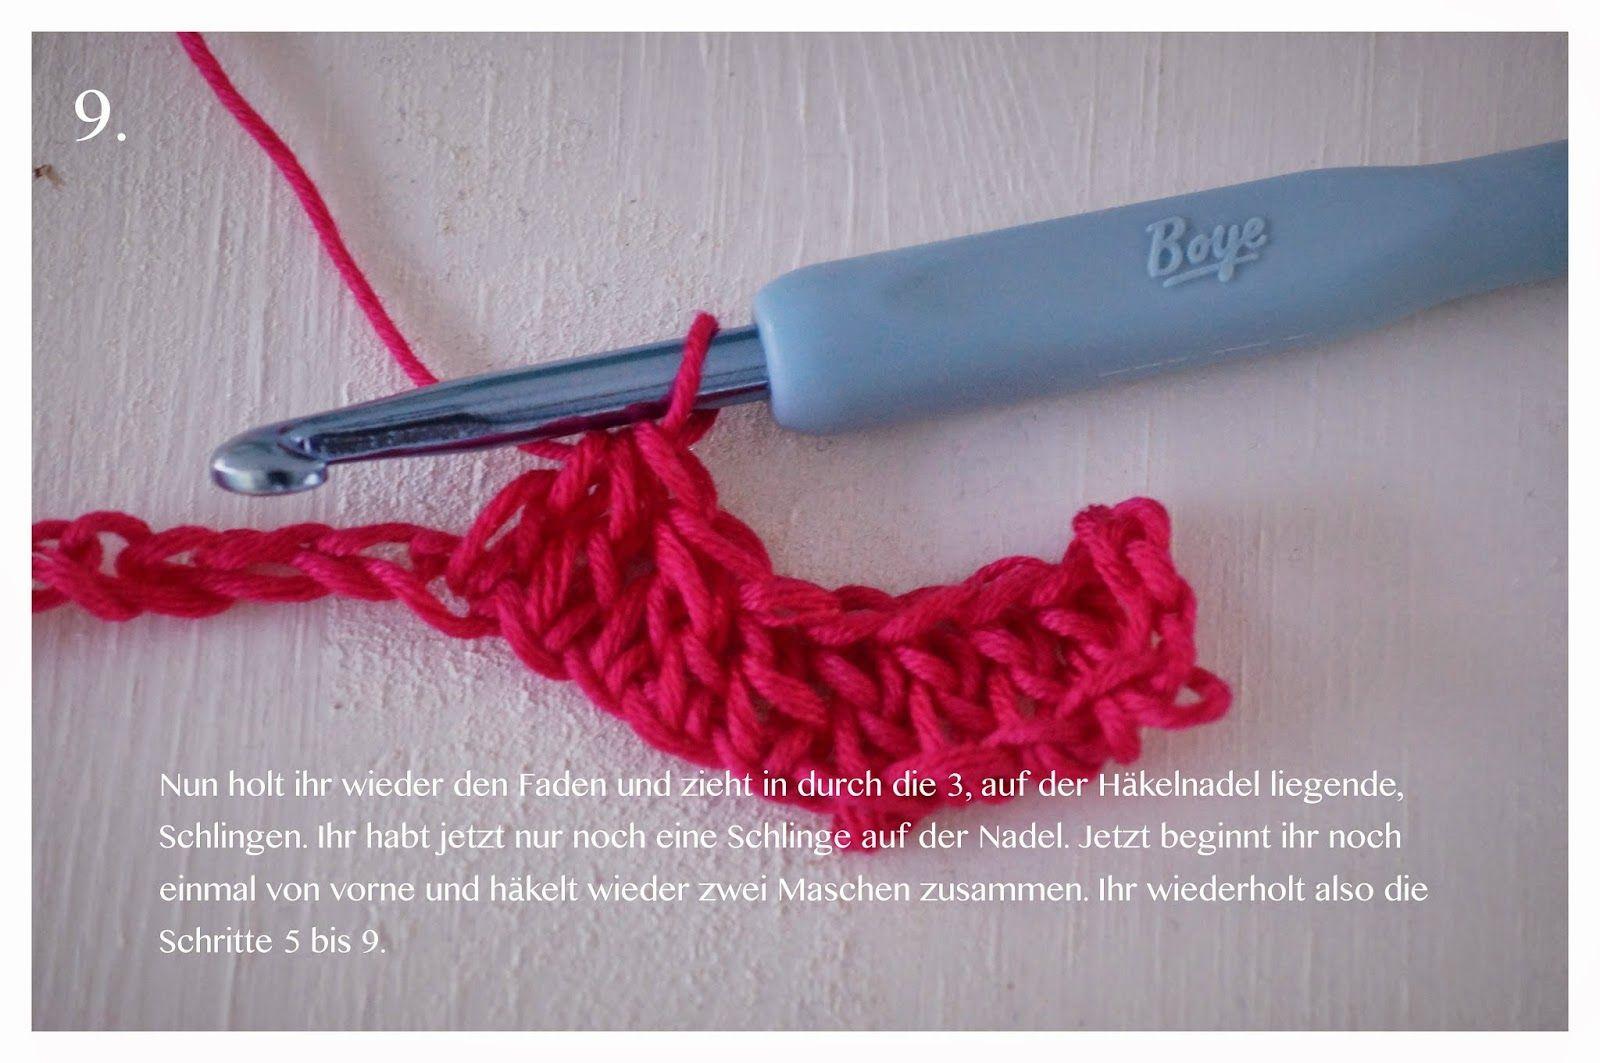 Crochet Ripple Blanket Häkeldecke Mit Wellenmuster Anleitung